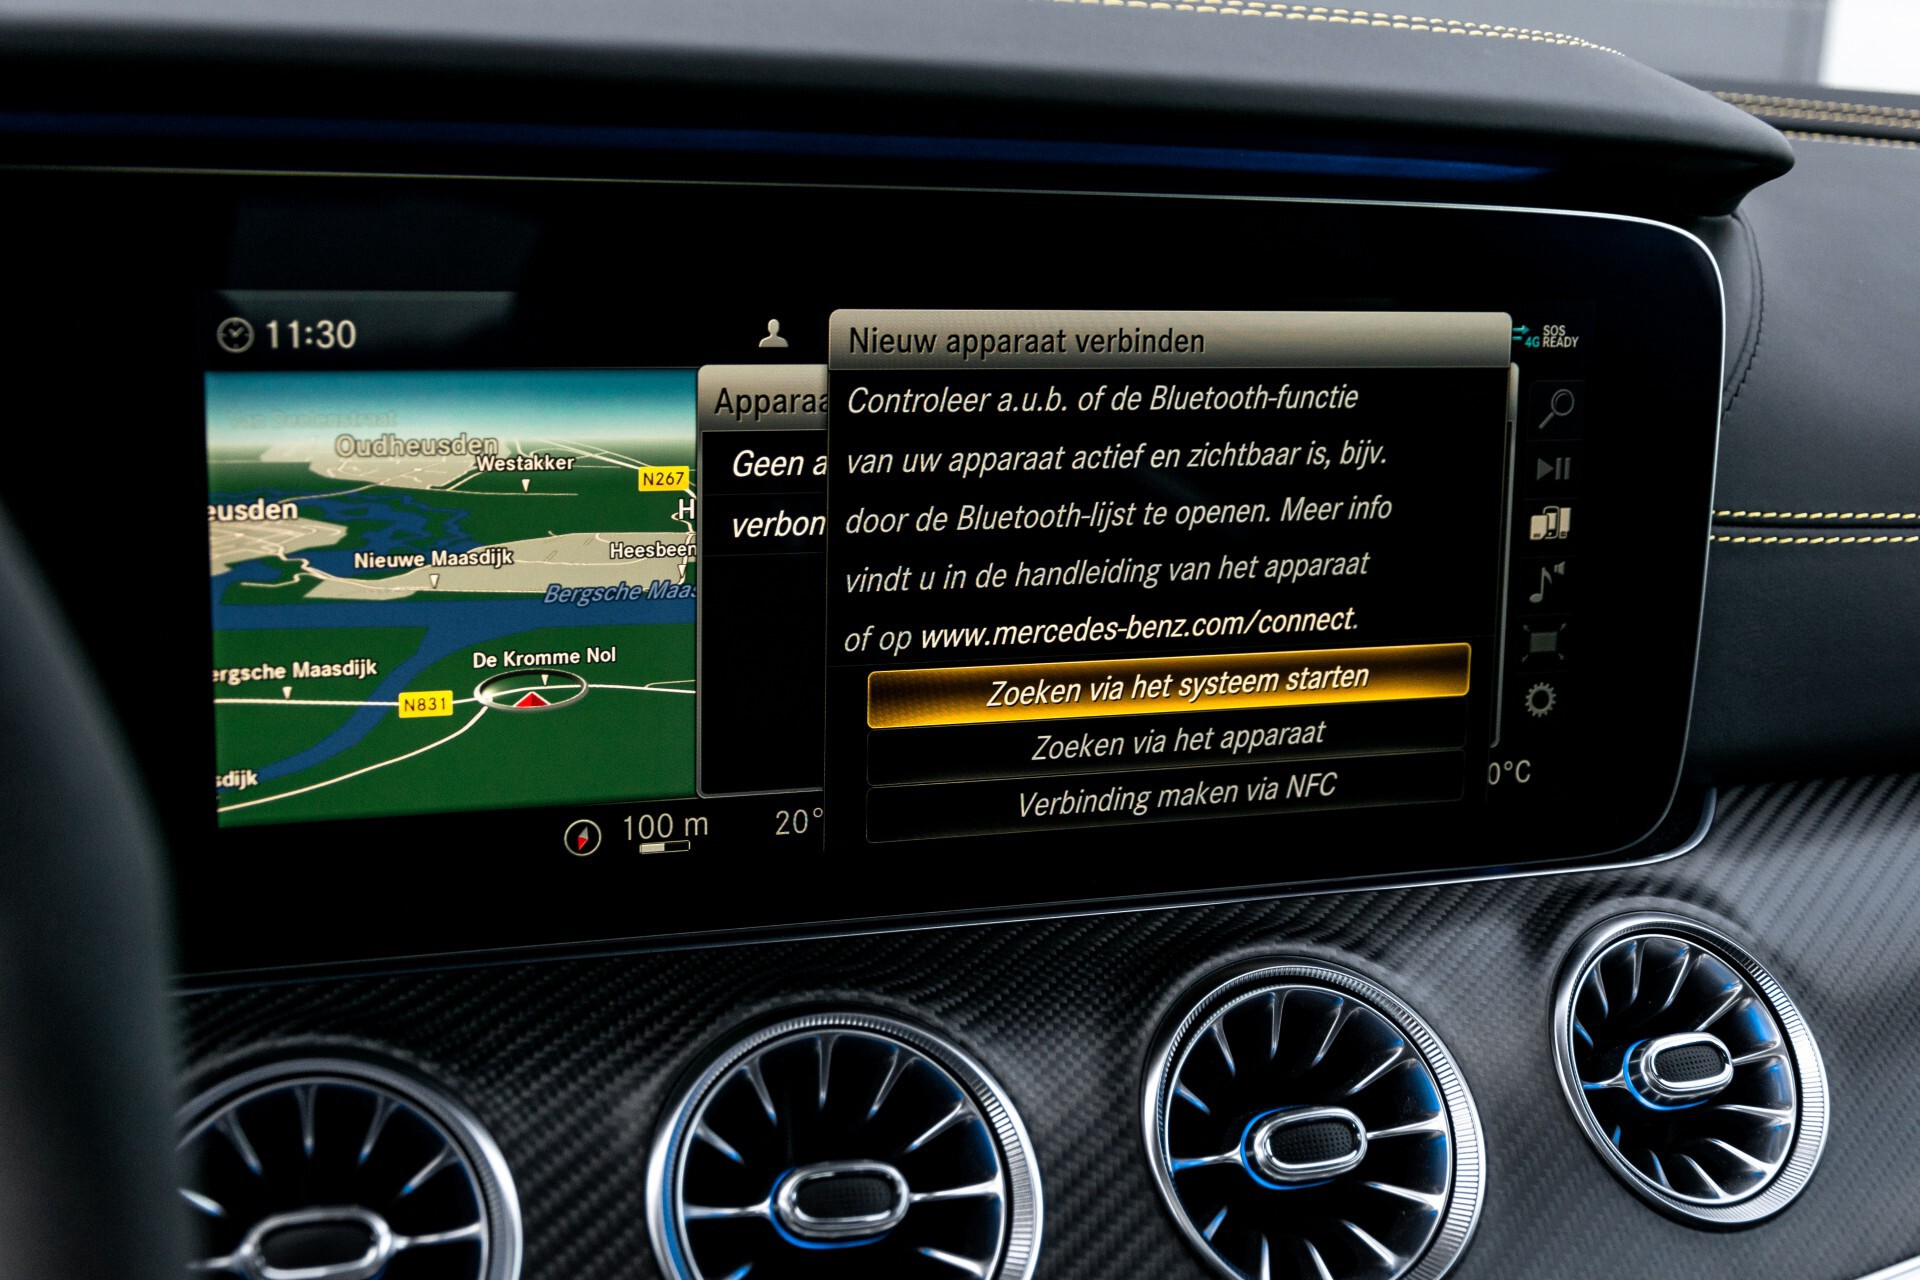 Mercedes-Benz AMG GT 4-Door Coupe 63 S 4MATIC+ Edition 1 Keramisch/Carbon/First Class/Dynamic Plus/Burmester High End 3D Aut9 Foto 23